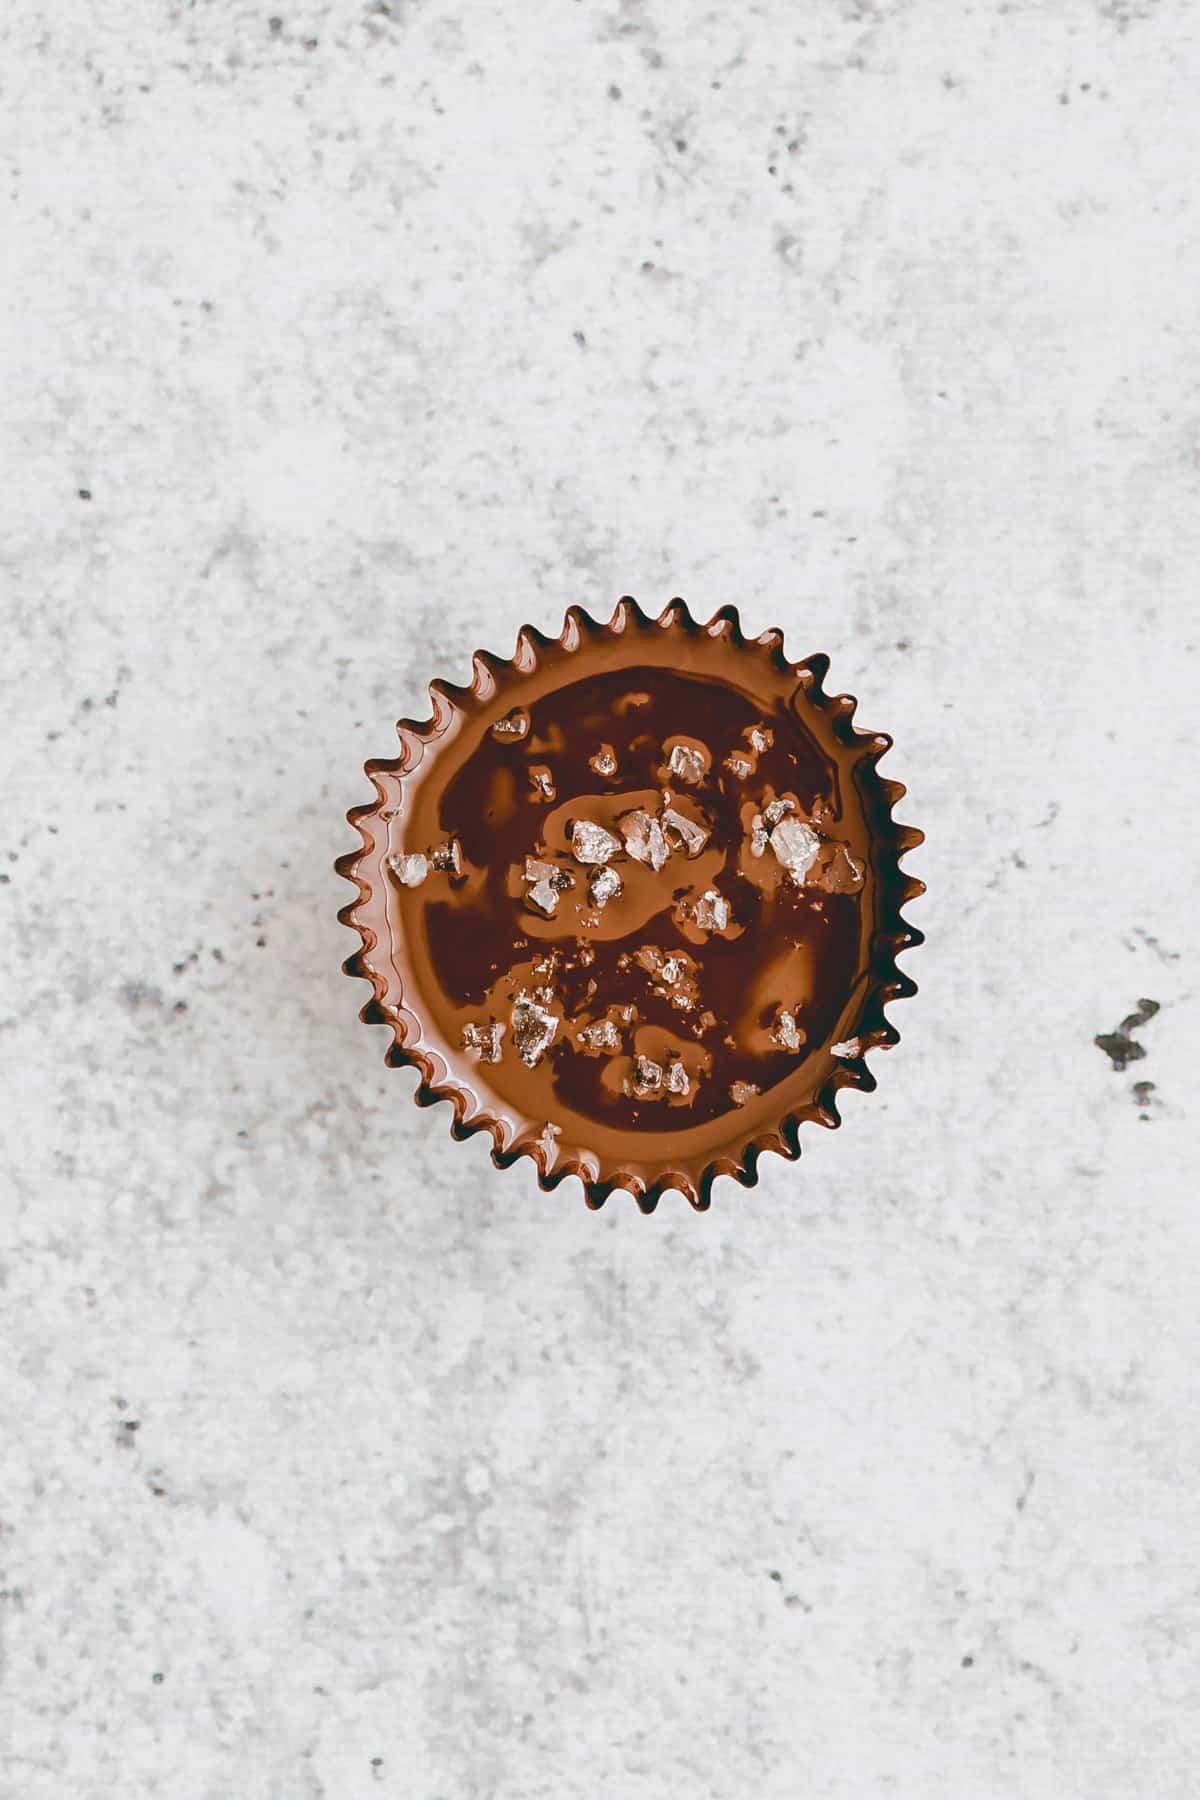 Salted Caramel Chocolate Cups Recipe Step-7